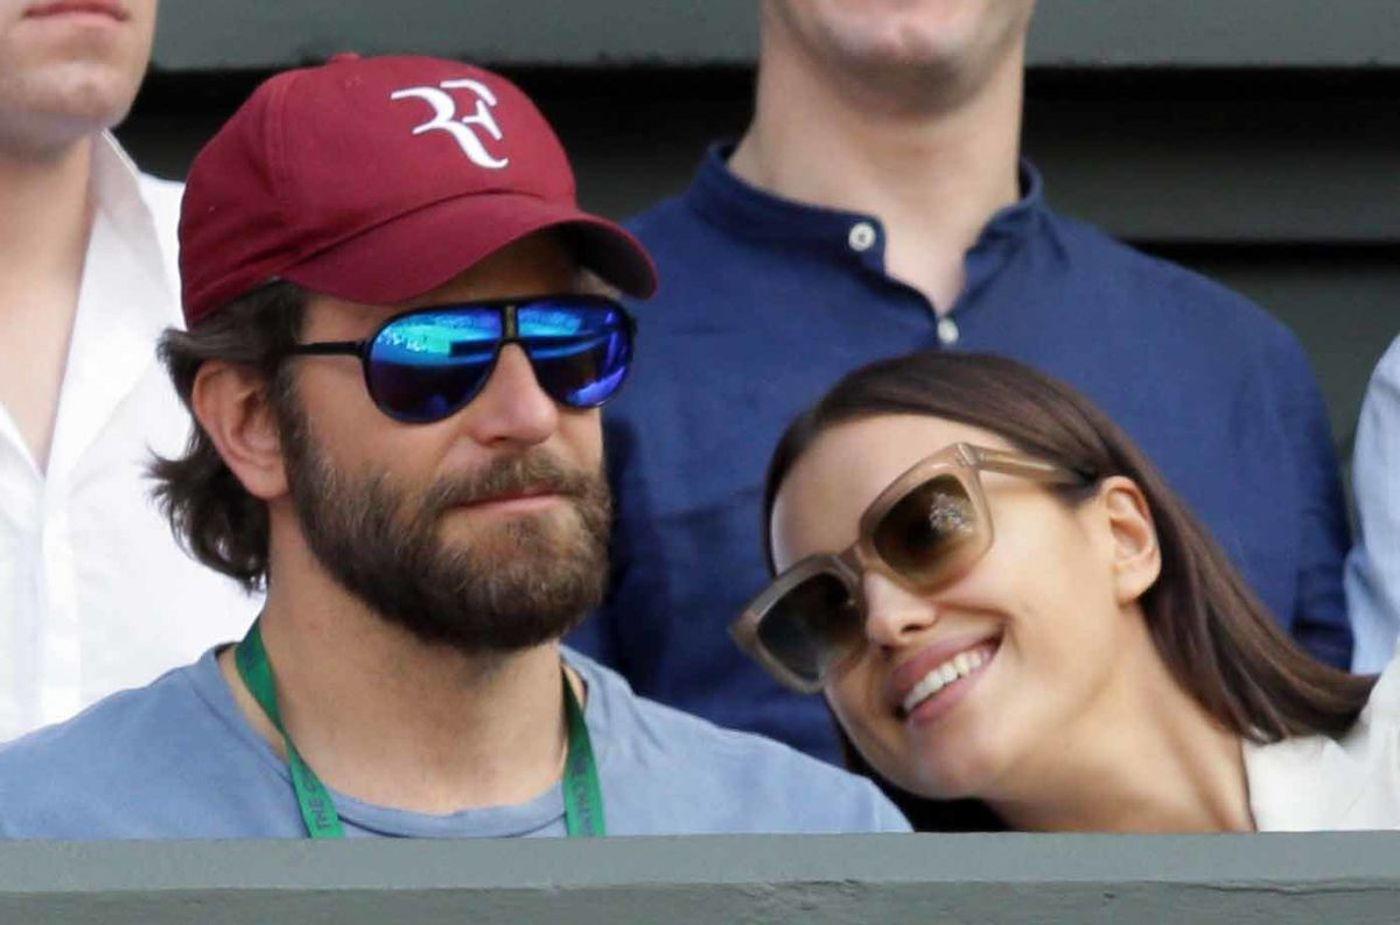 Bradley Cooper shoots 'A Star Is Born' at Glastonbury, introduces Kris Kristofferson